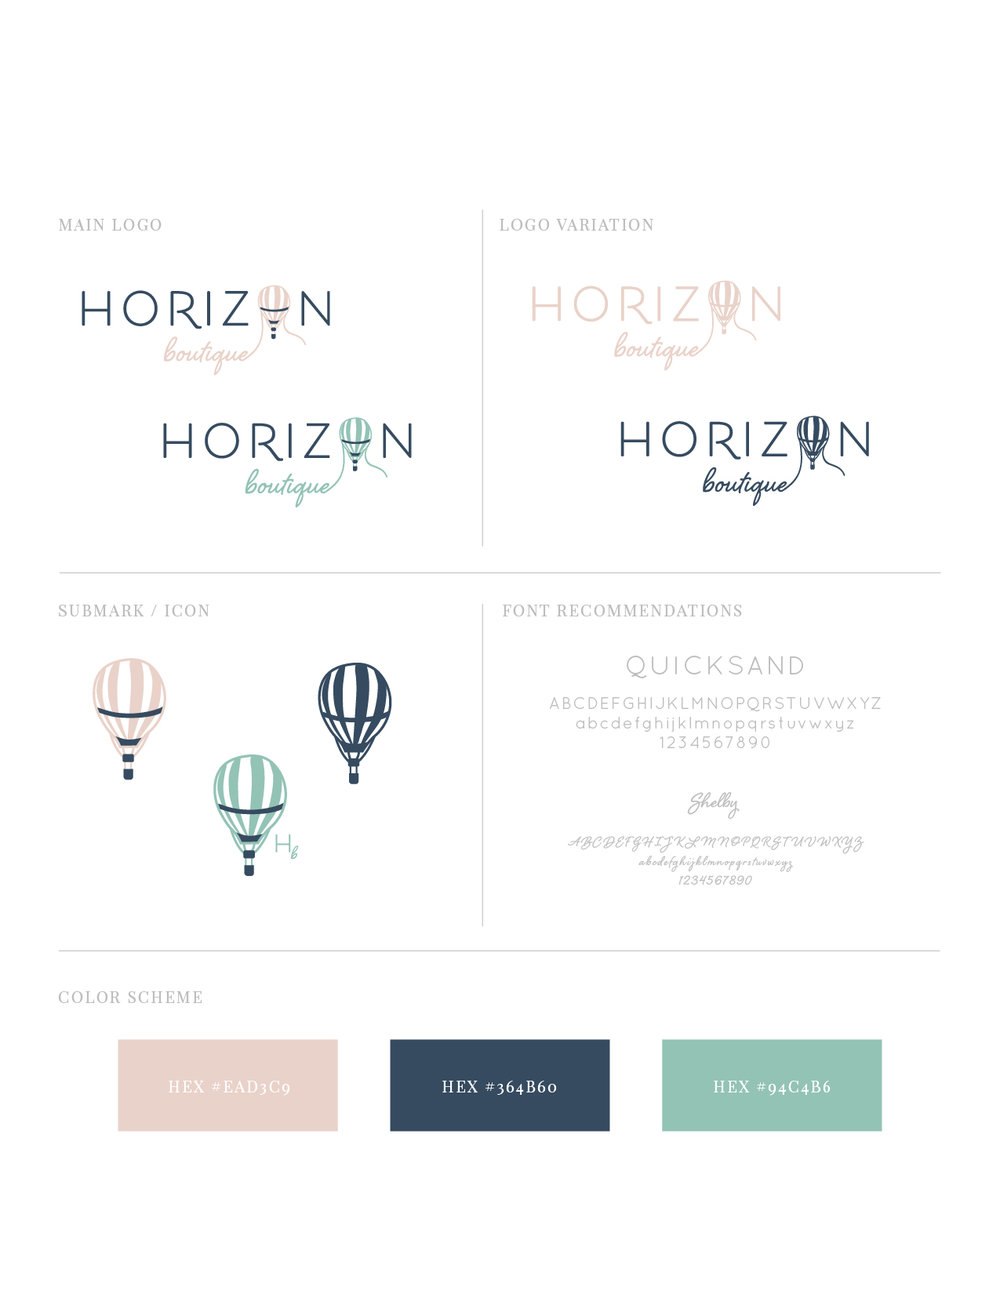 HorizonBoutique-LogoGuidelines-U-01.jpg